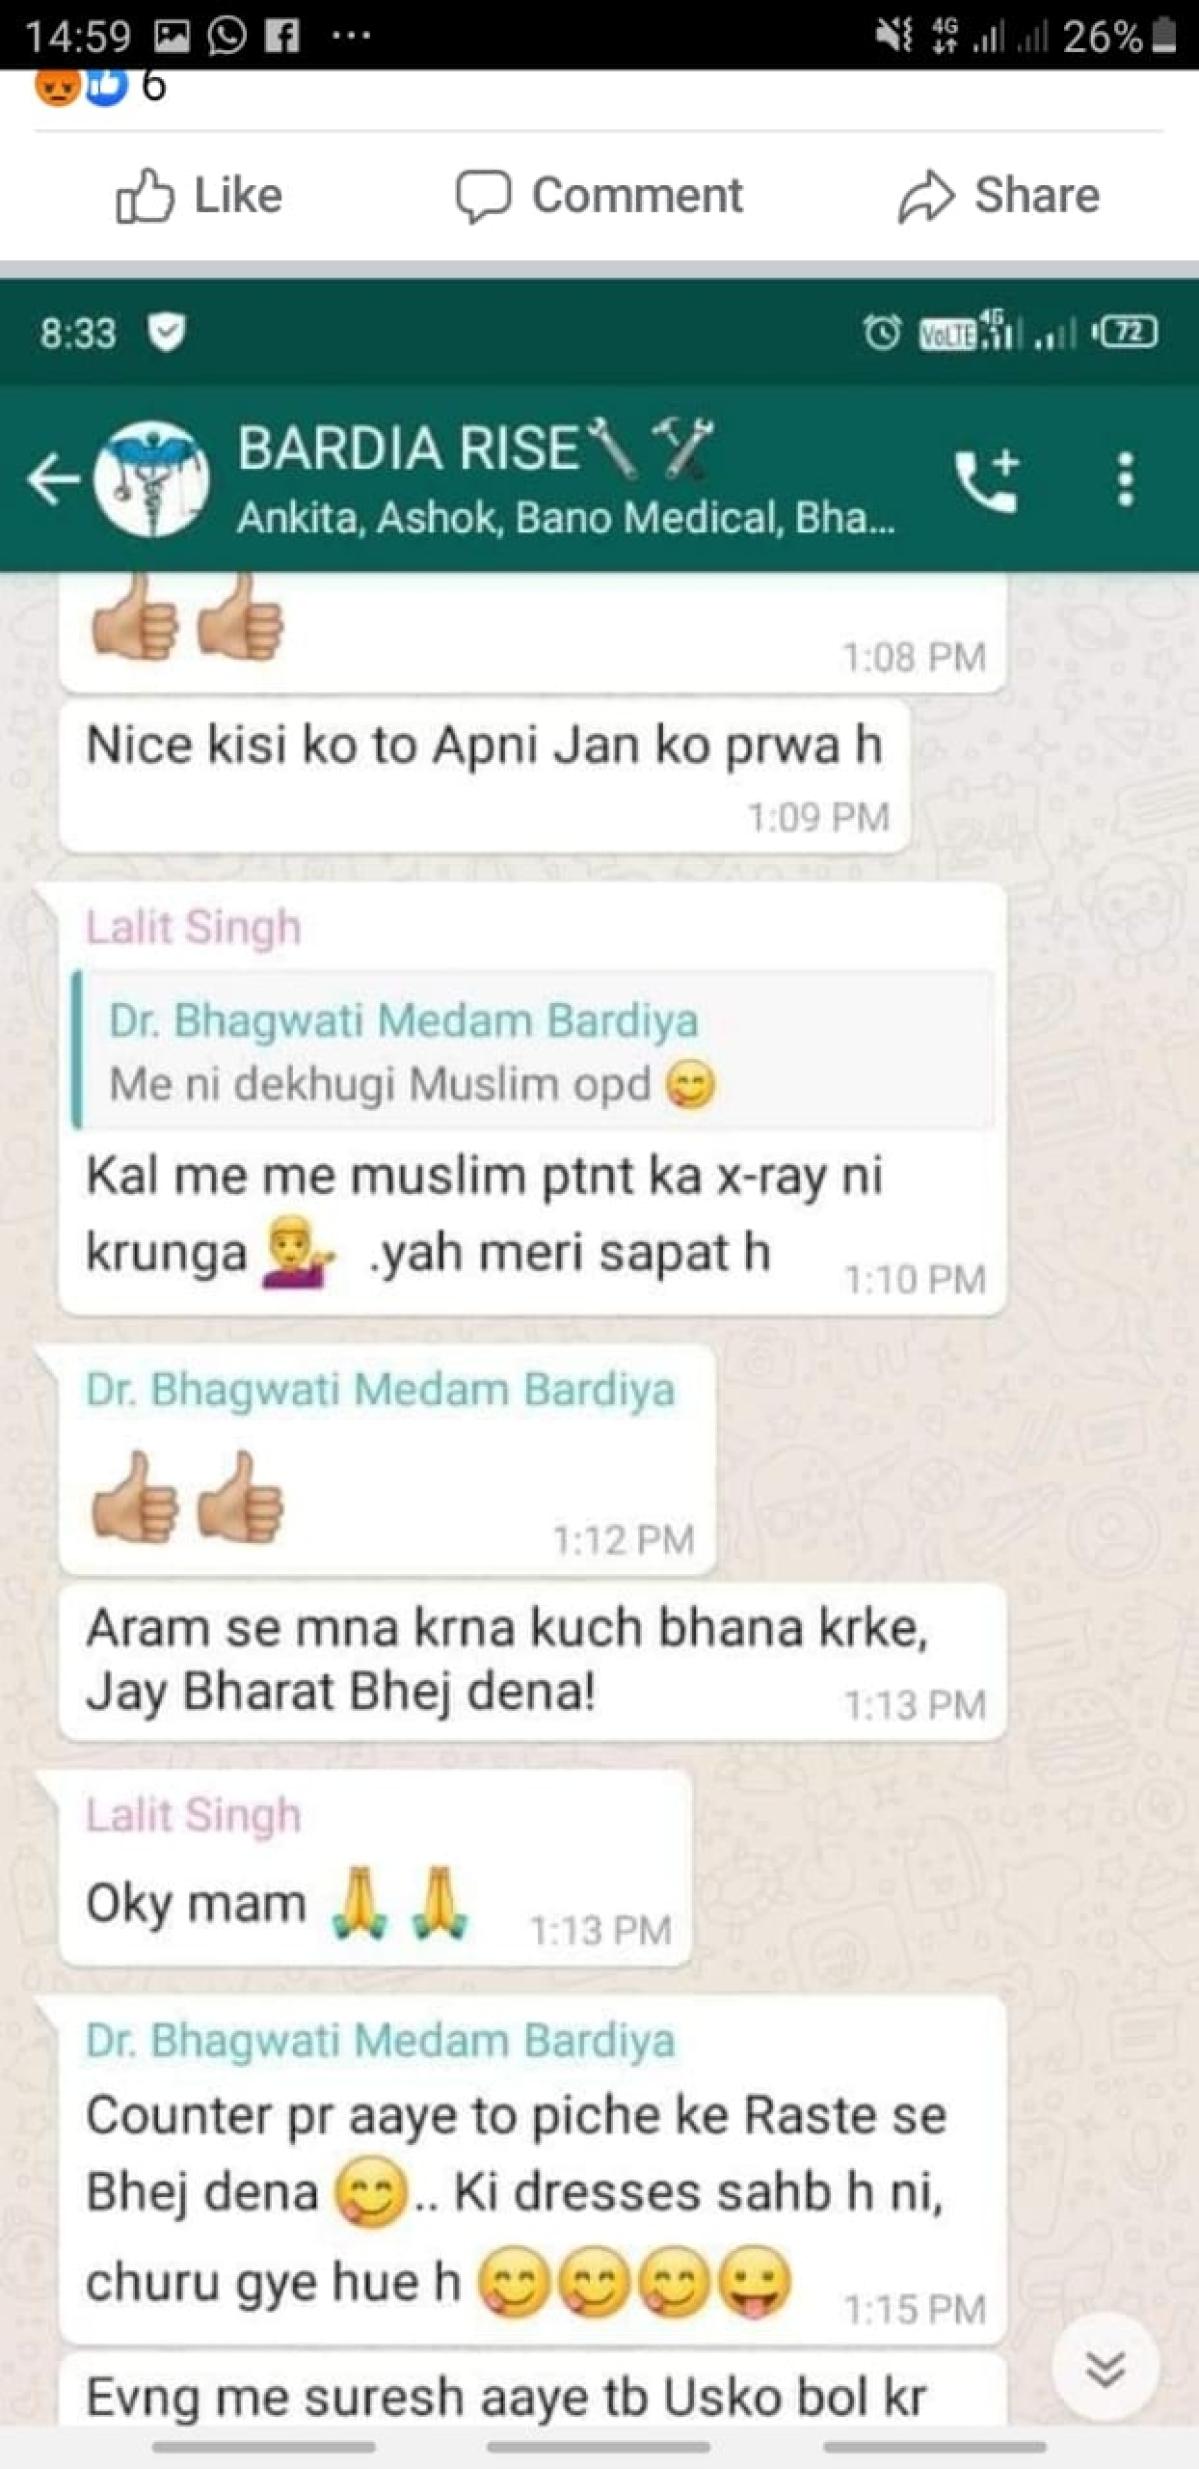 FIR against Churu's Sardarshar hospital as chat against Muslim community goes viral